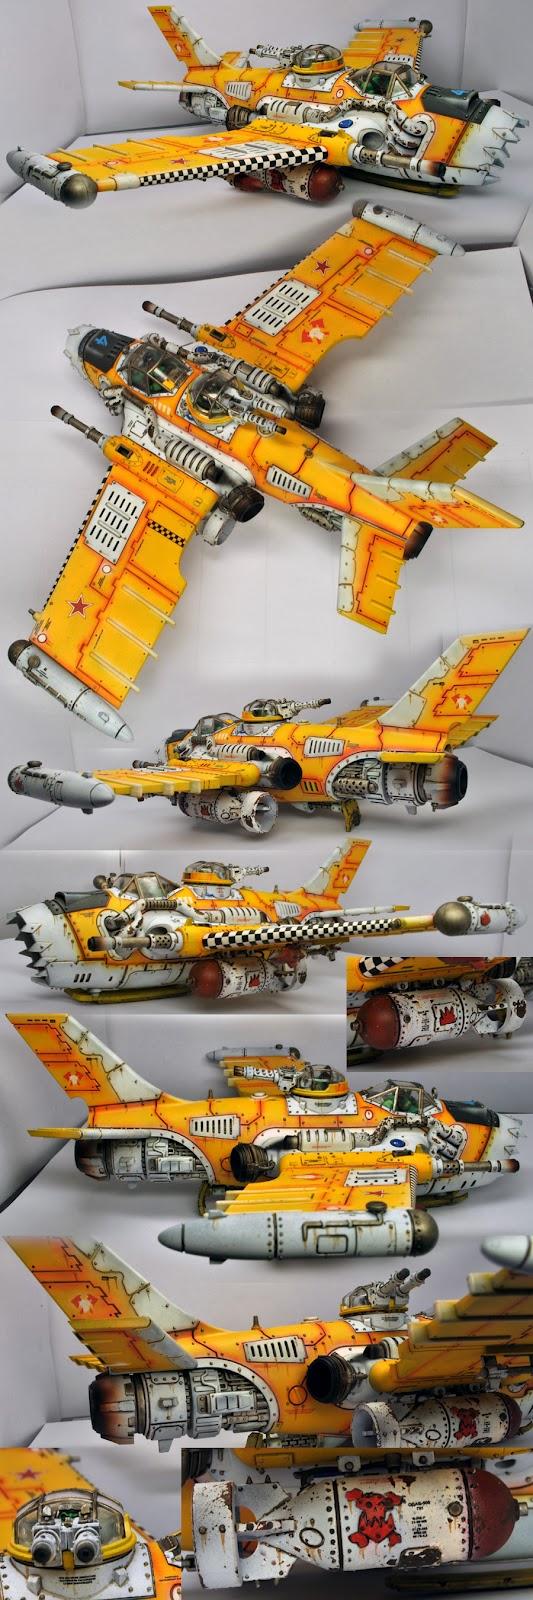 Warhammer 40000 Bombardero Orko